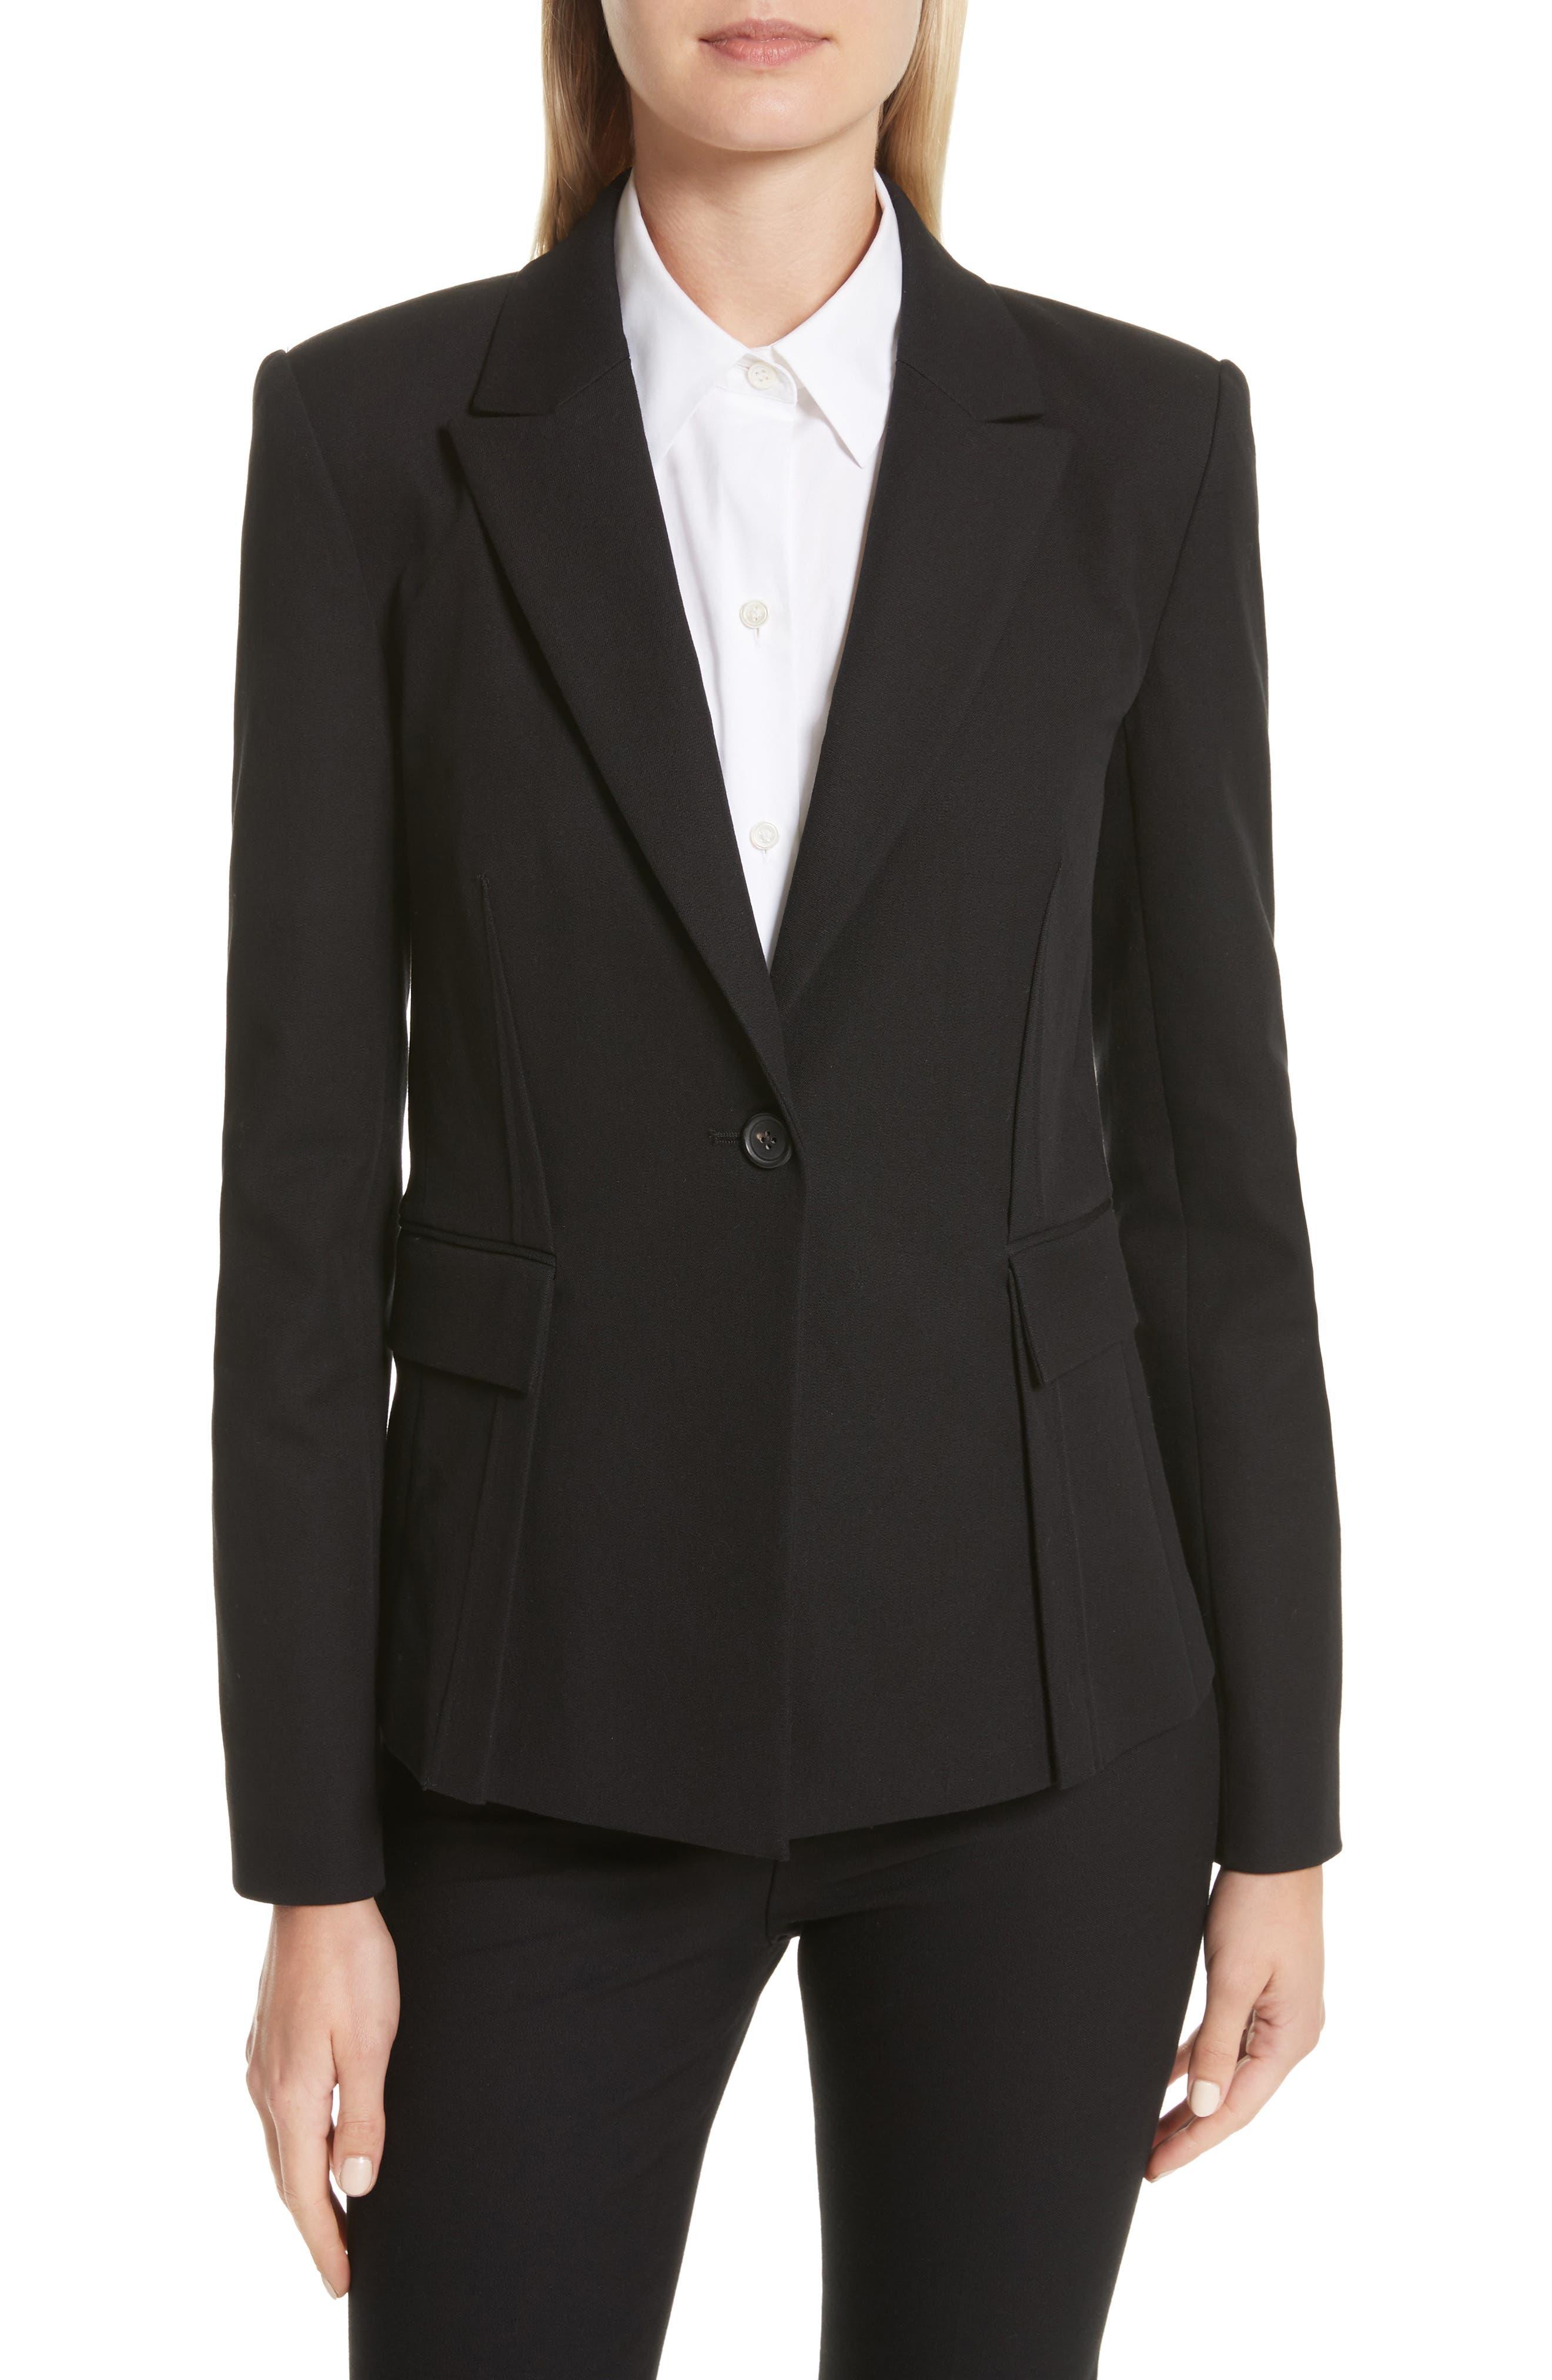 Grommet Tie Back Blazer,                         Main,                         color, Black